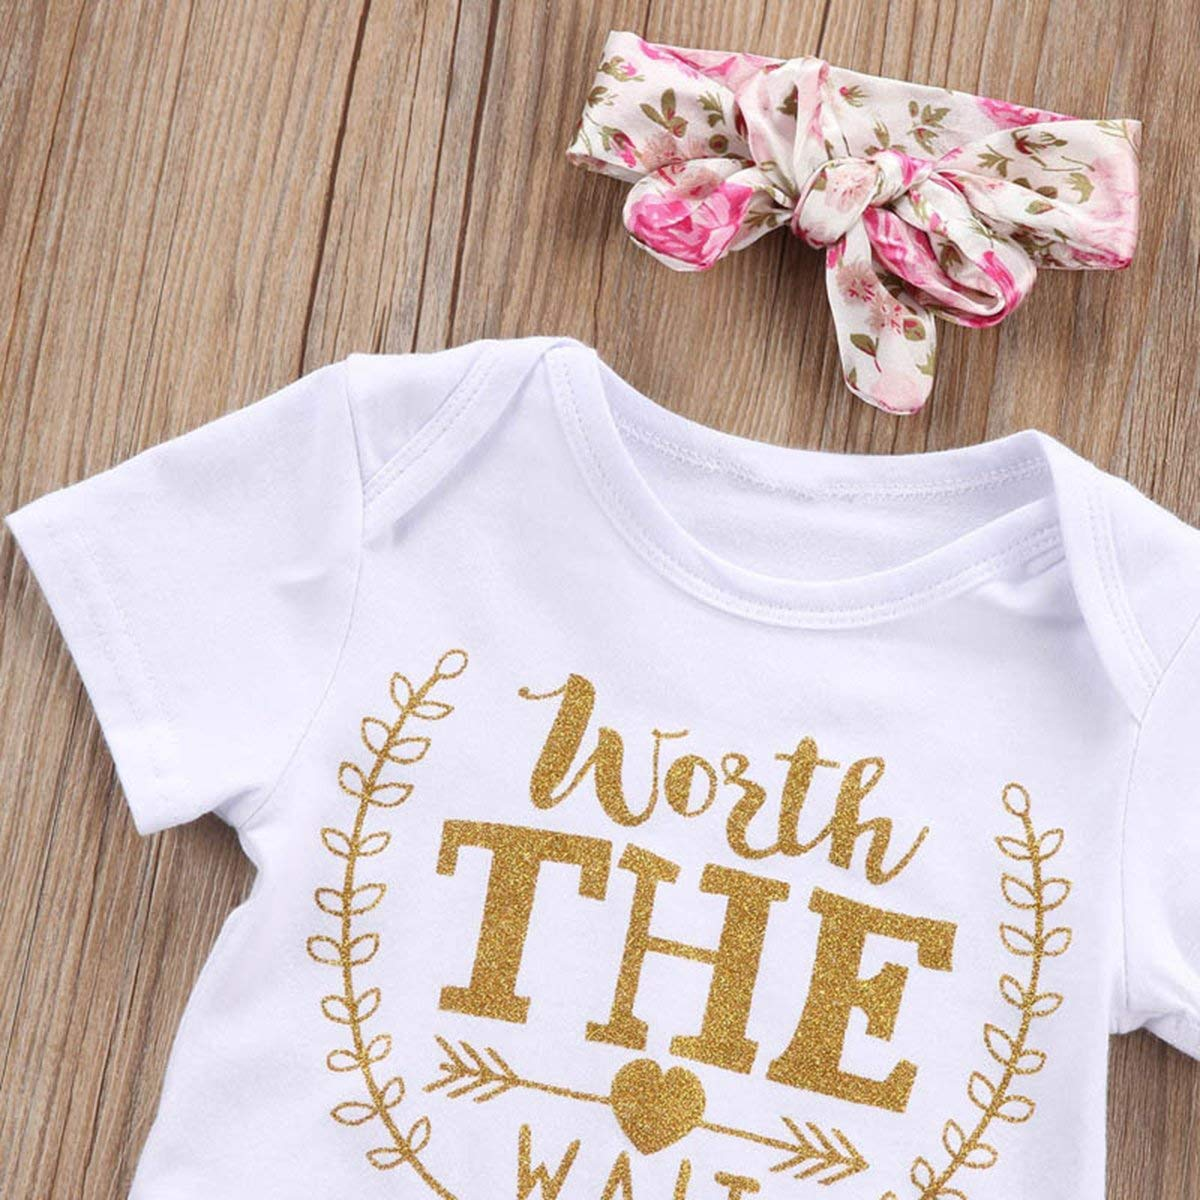 3Pcs Cute Worth The Wait Outfits Onesie Newborn Baby Boy Girl Onsie Set Bodysuits Short Sleeve Romper Jumpsuit Clothes